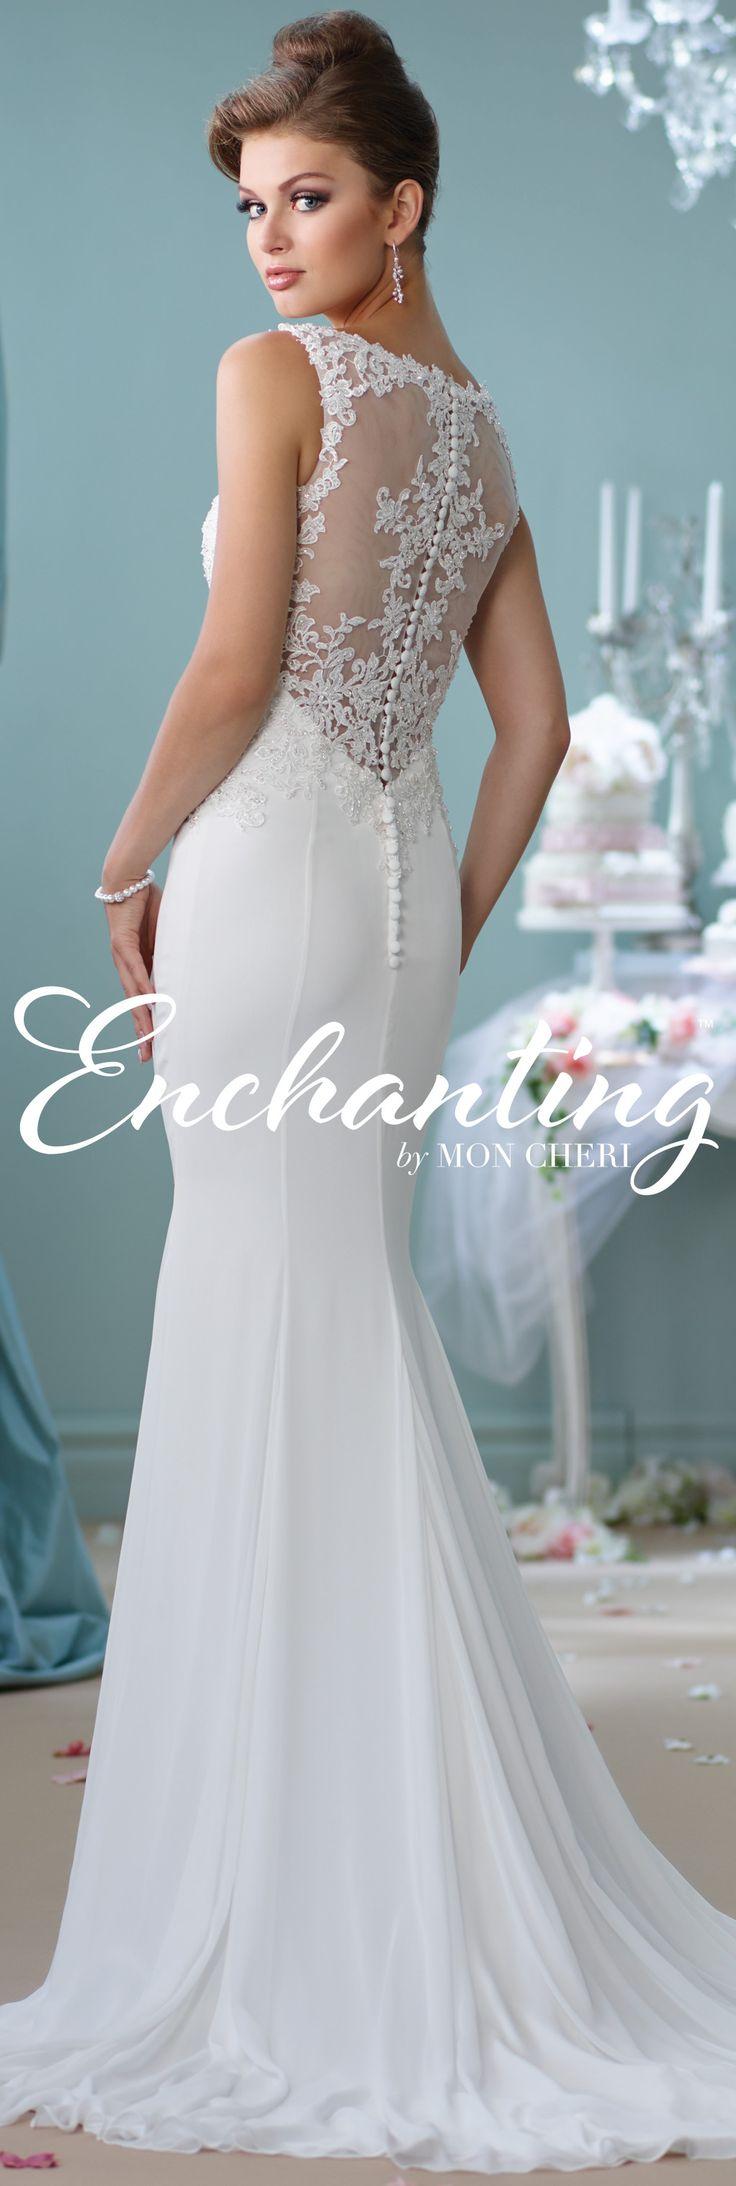 38 best Bridal Dresses Ireland images on Pinterest | Short wedding ...